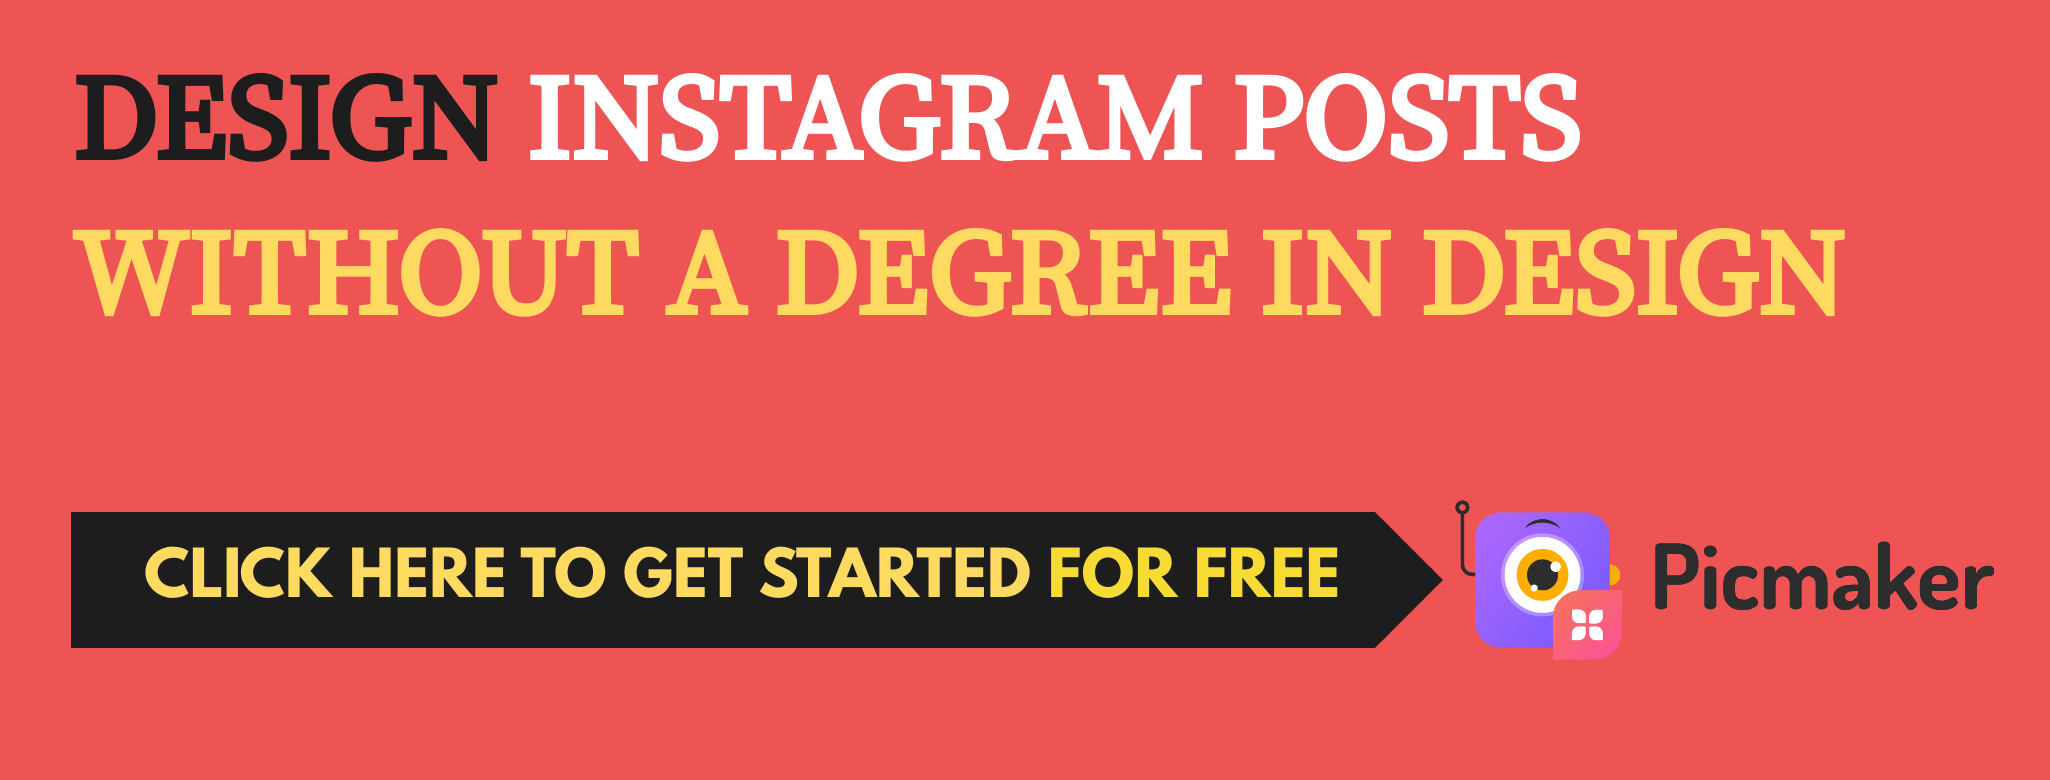 Design Instagram posts for free- Picmaker